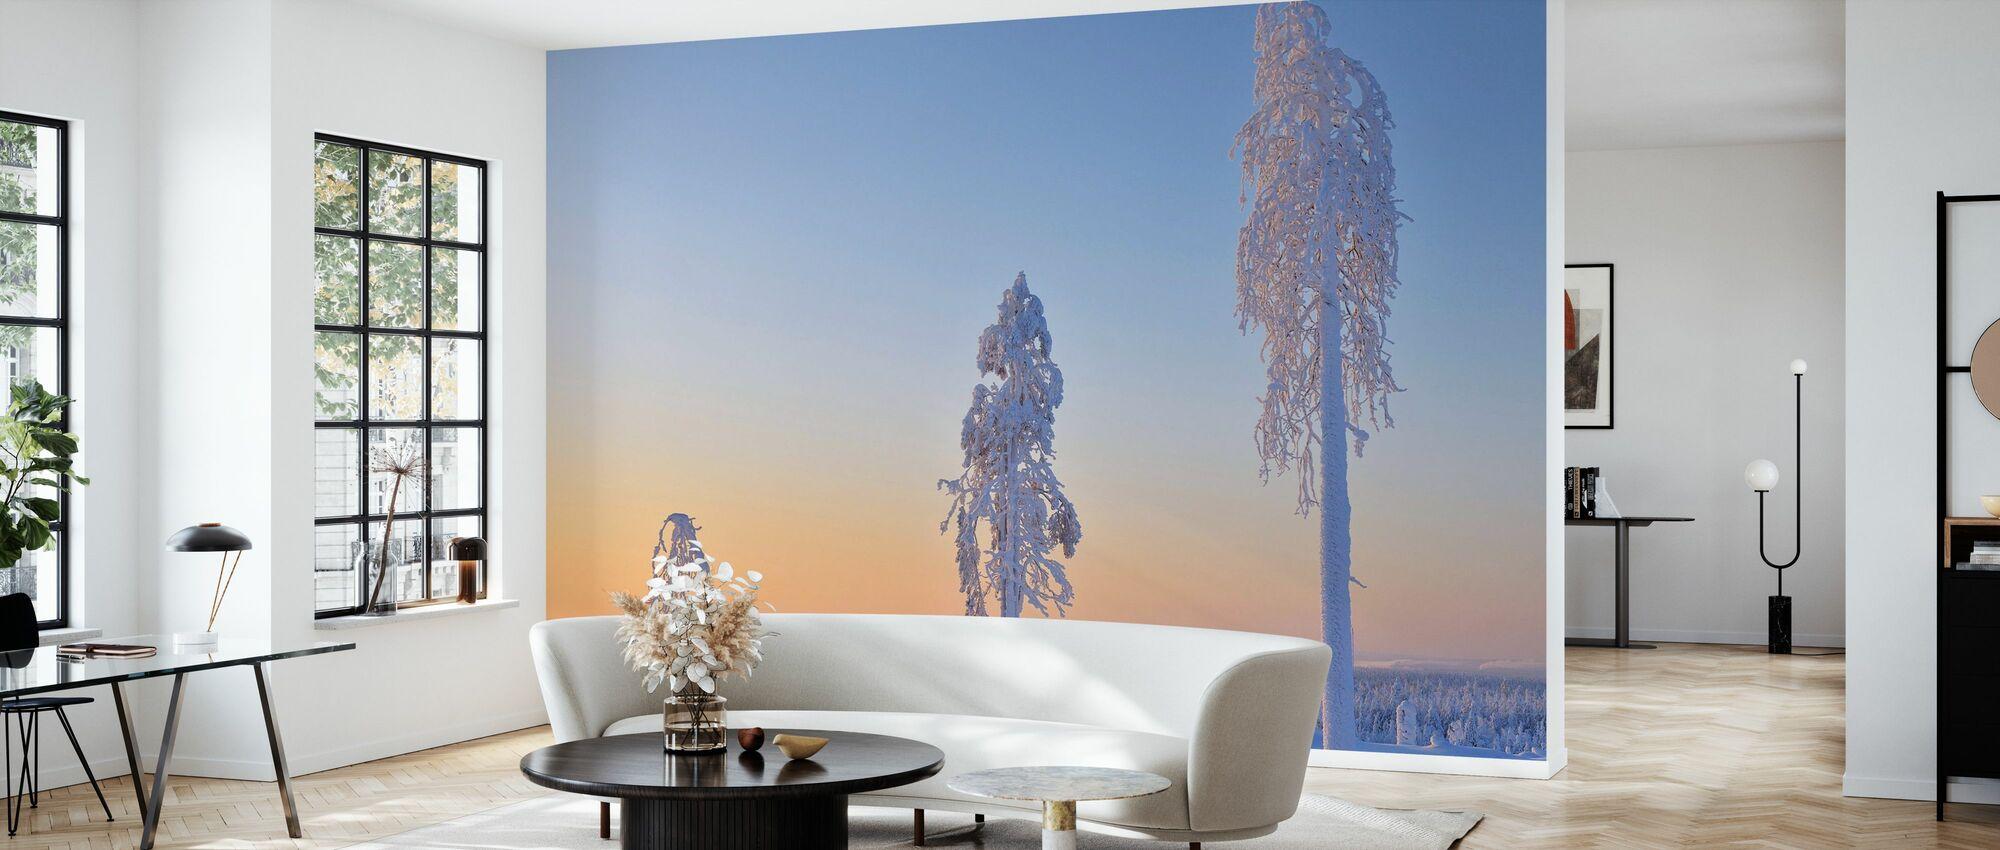 Ostrobothnia in Winter Dress - Wallpaper - Living Room